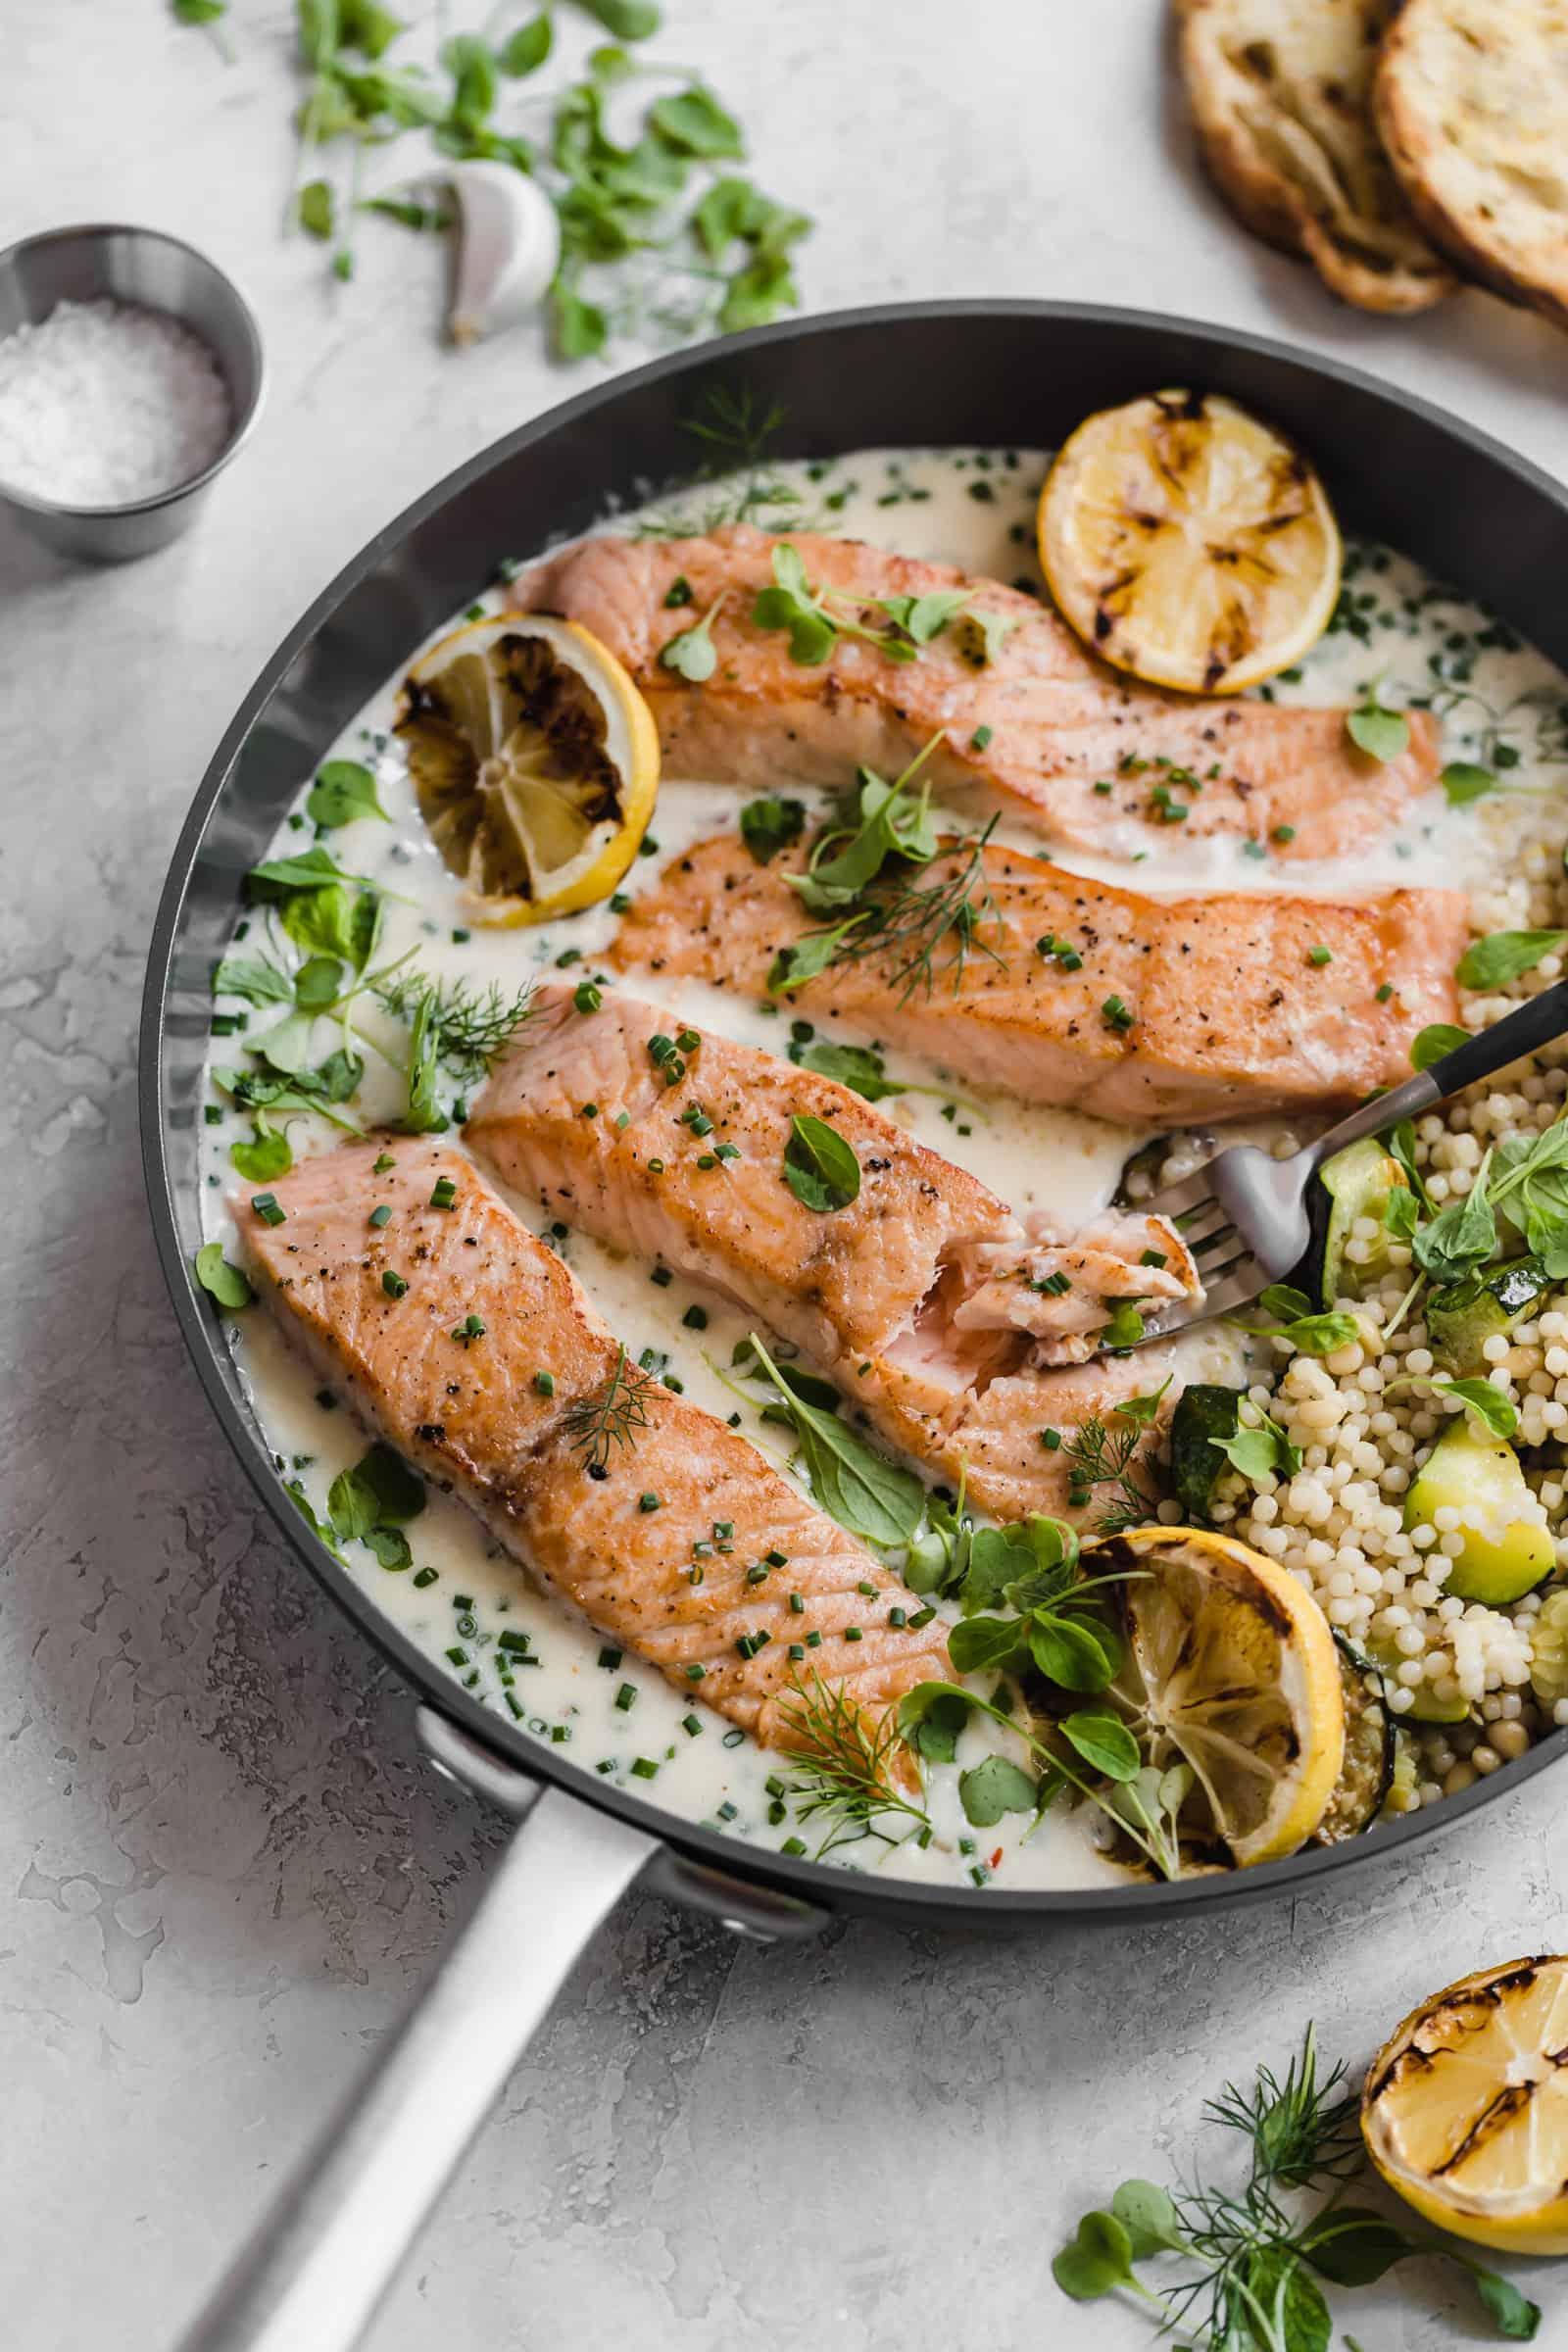 flaky salmon in parmesan herb pan sauce